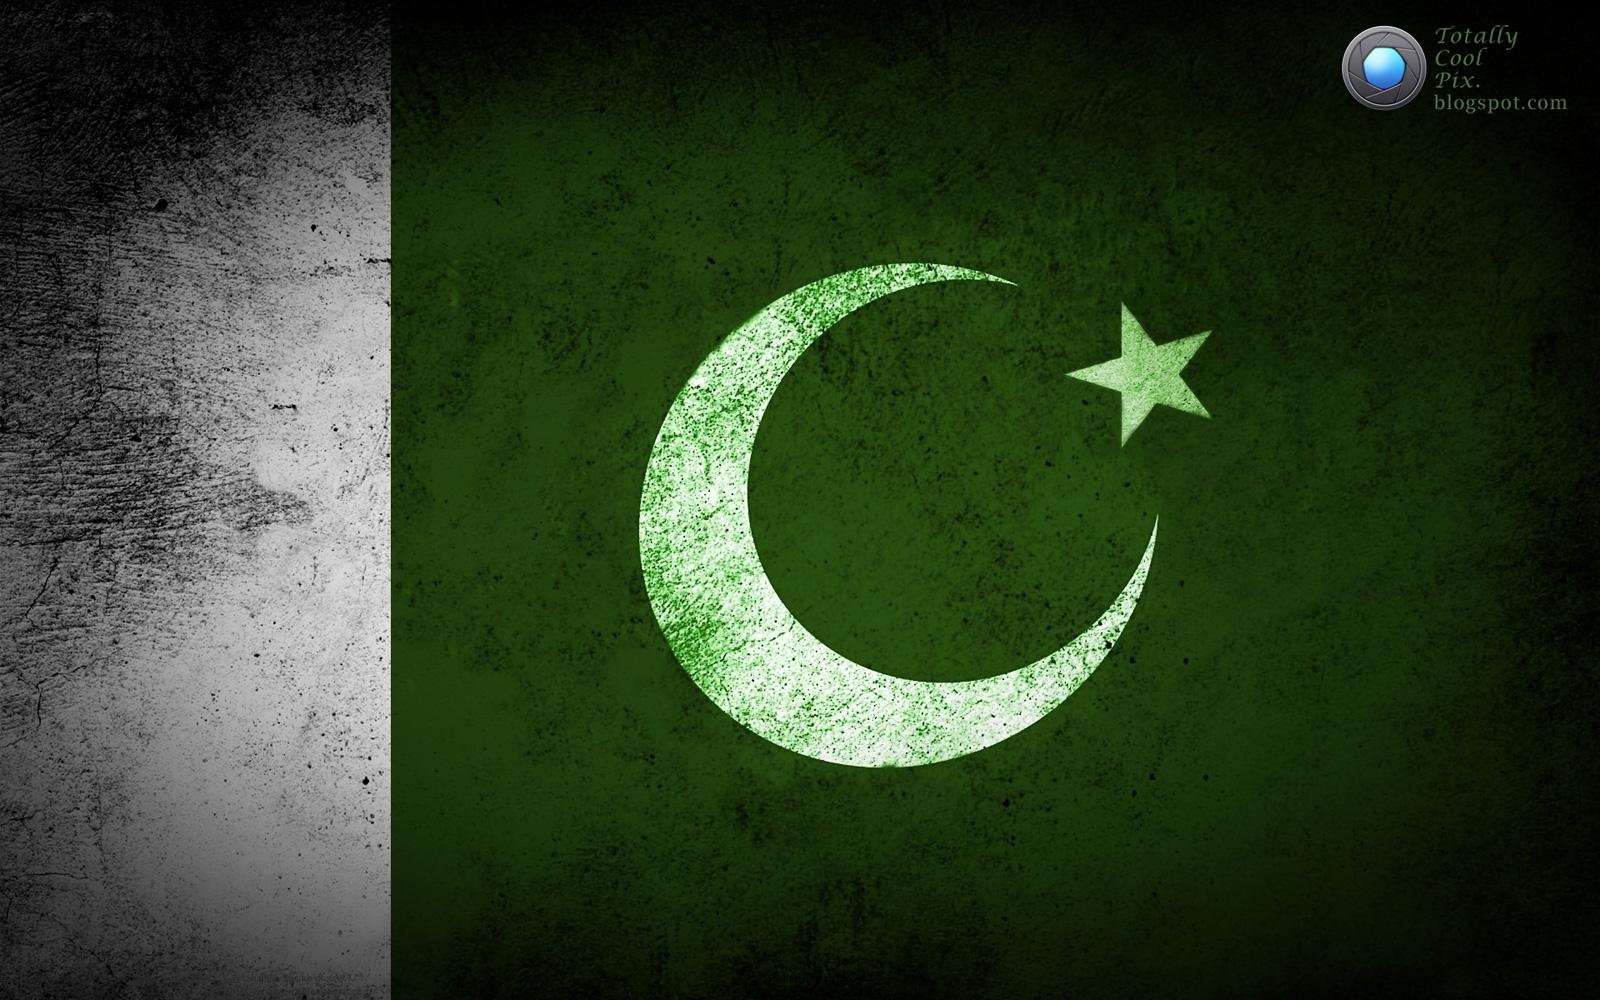 14 august pakistan wallpaper full - photo #14